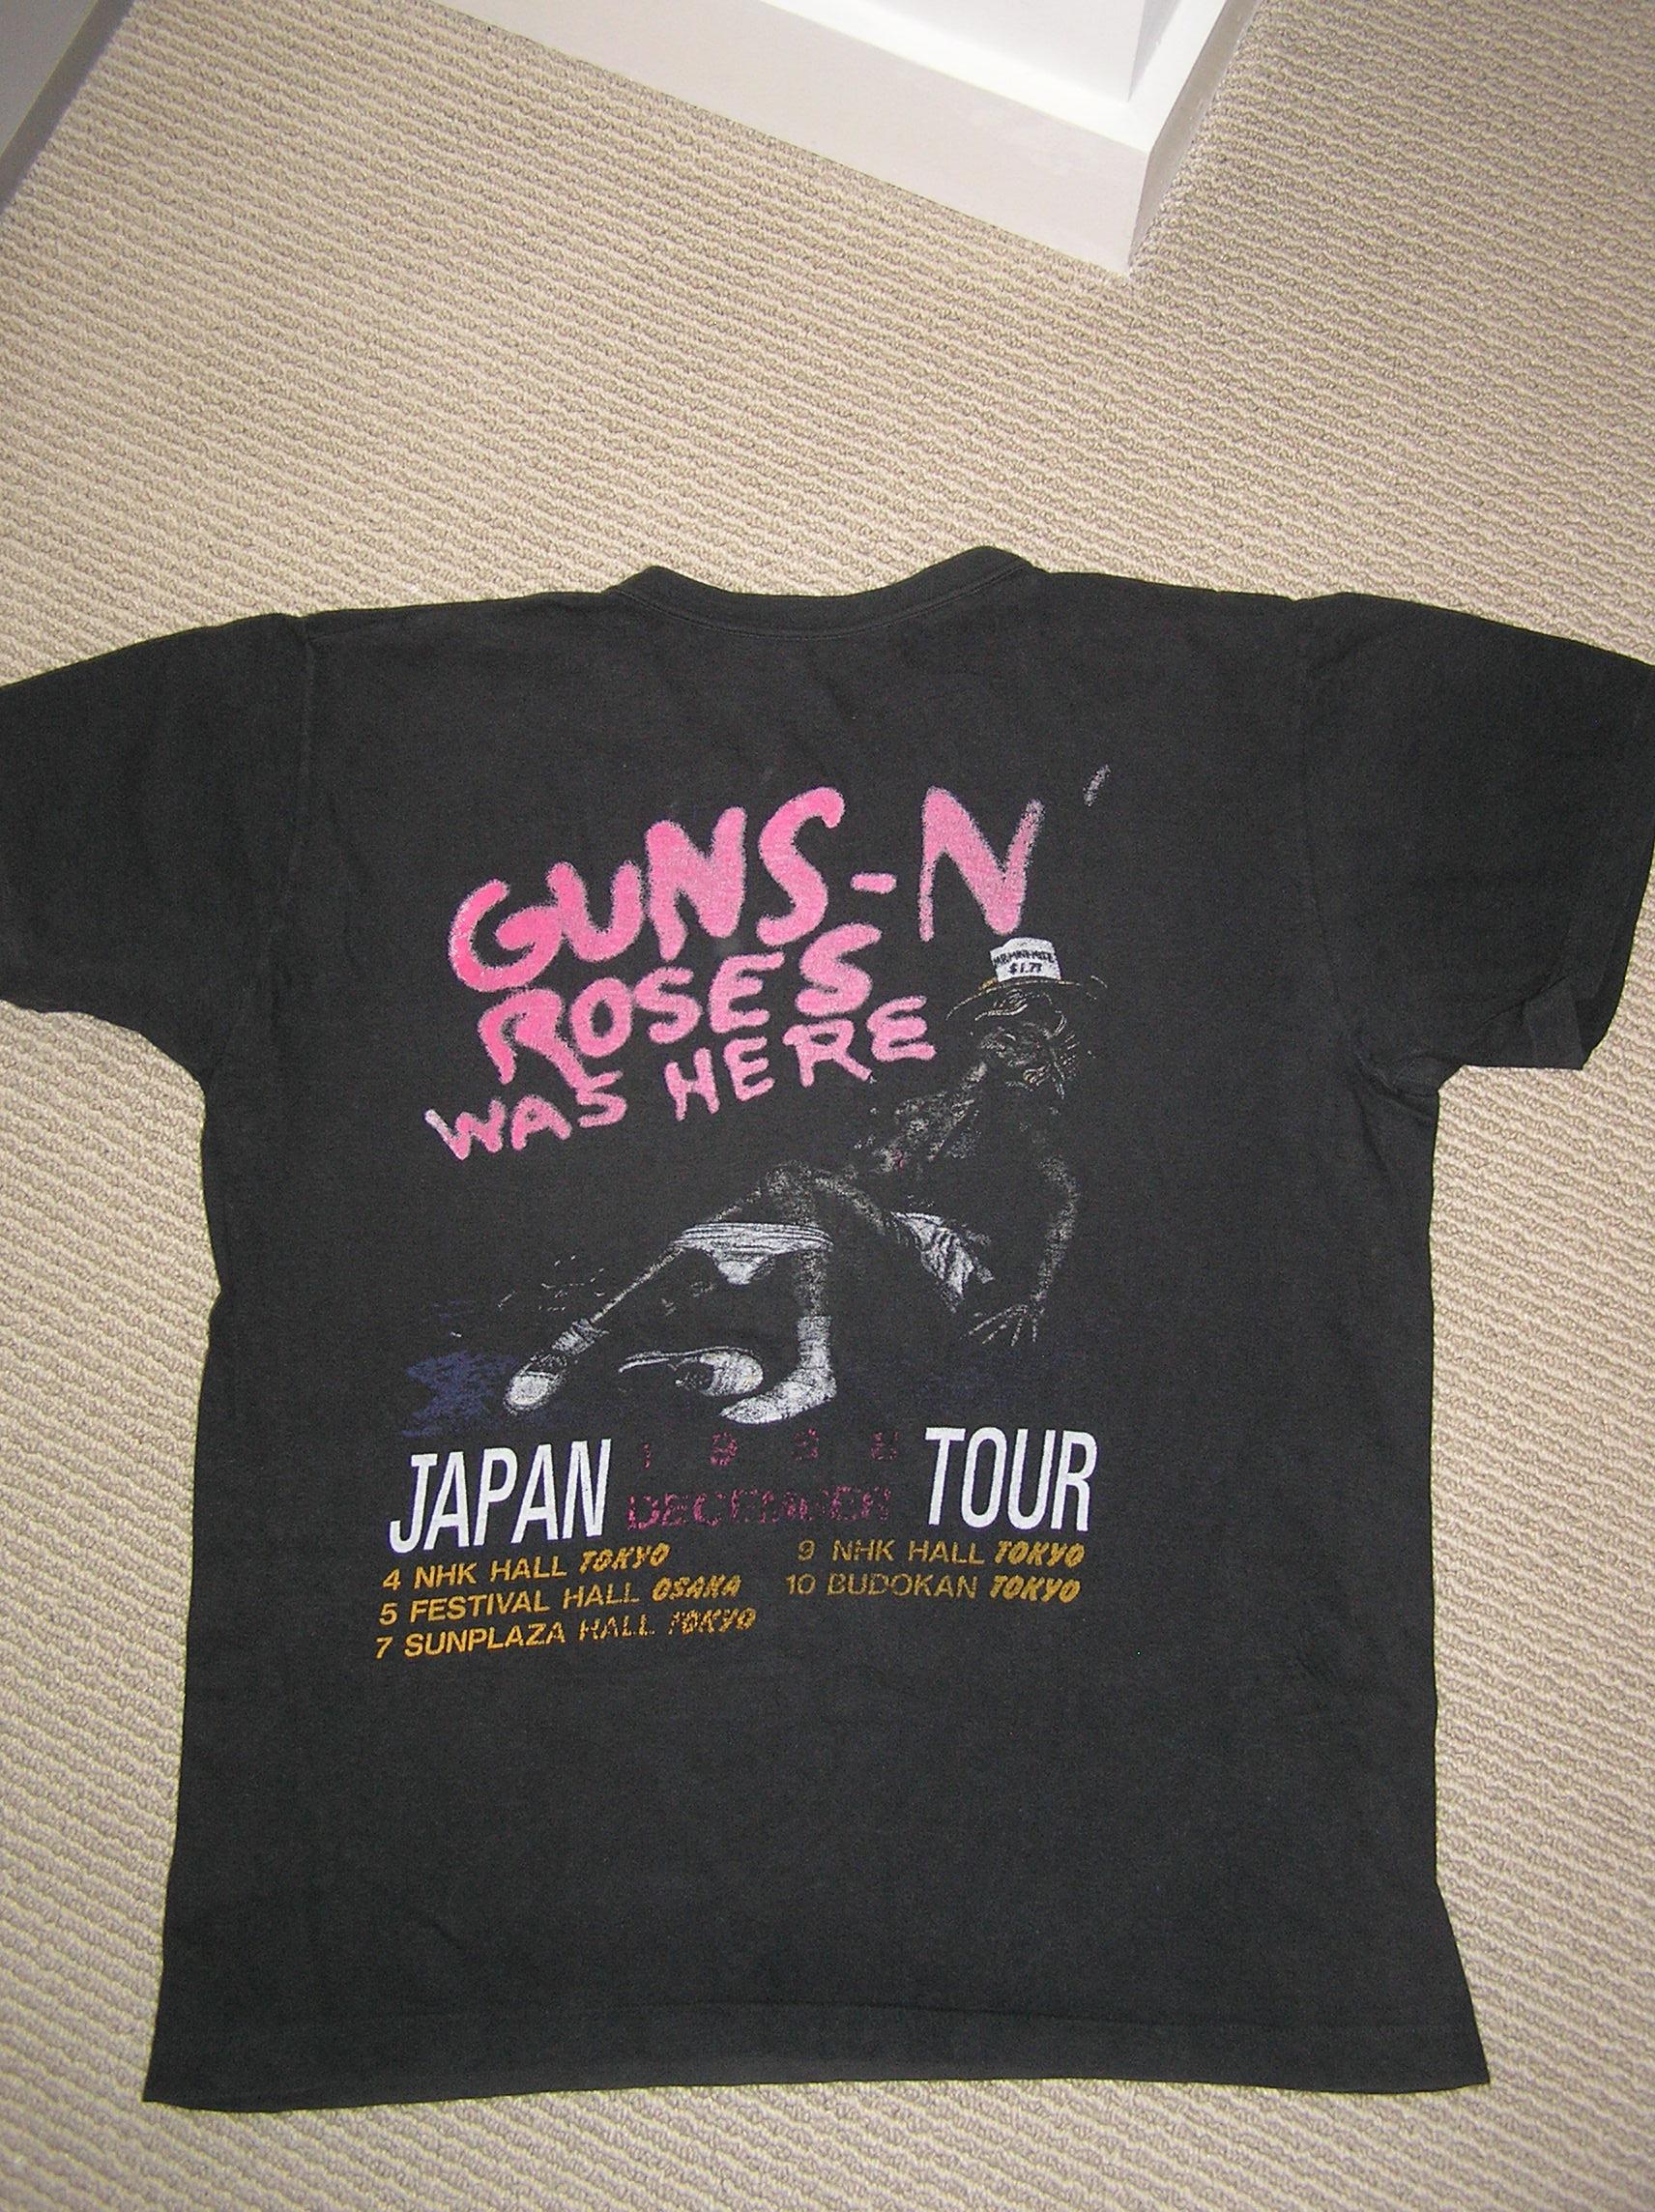 1987.11.21 - MTV Japan - Interviews with Axl ShirtJapAppTour2